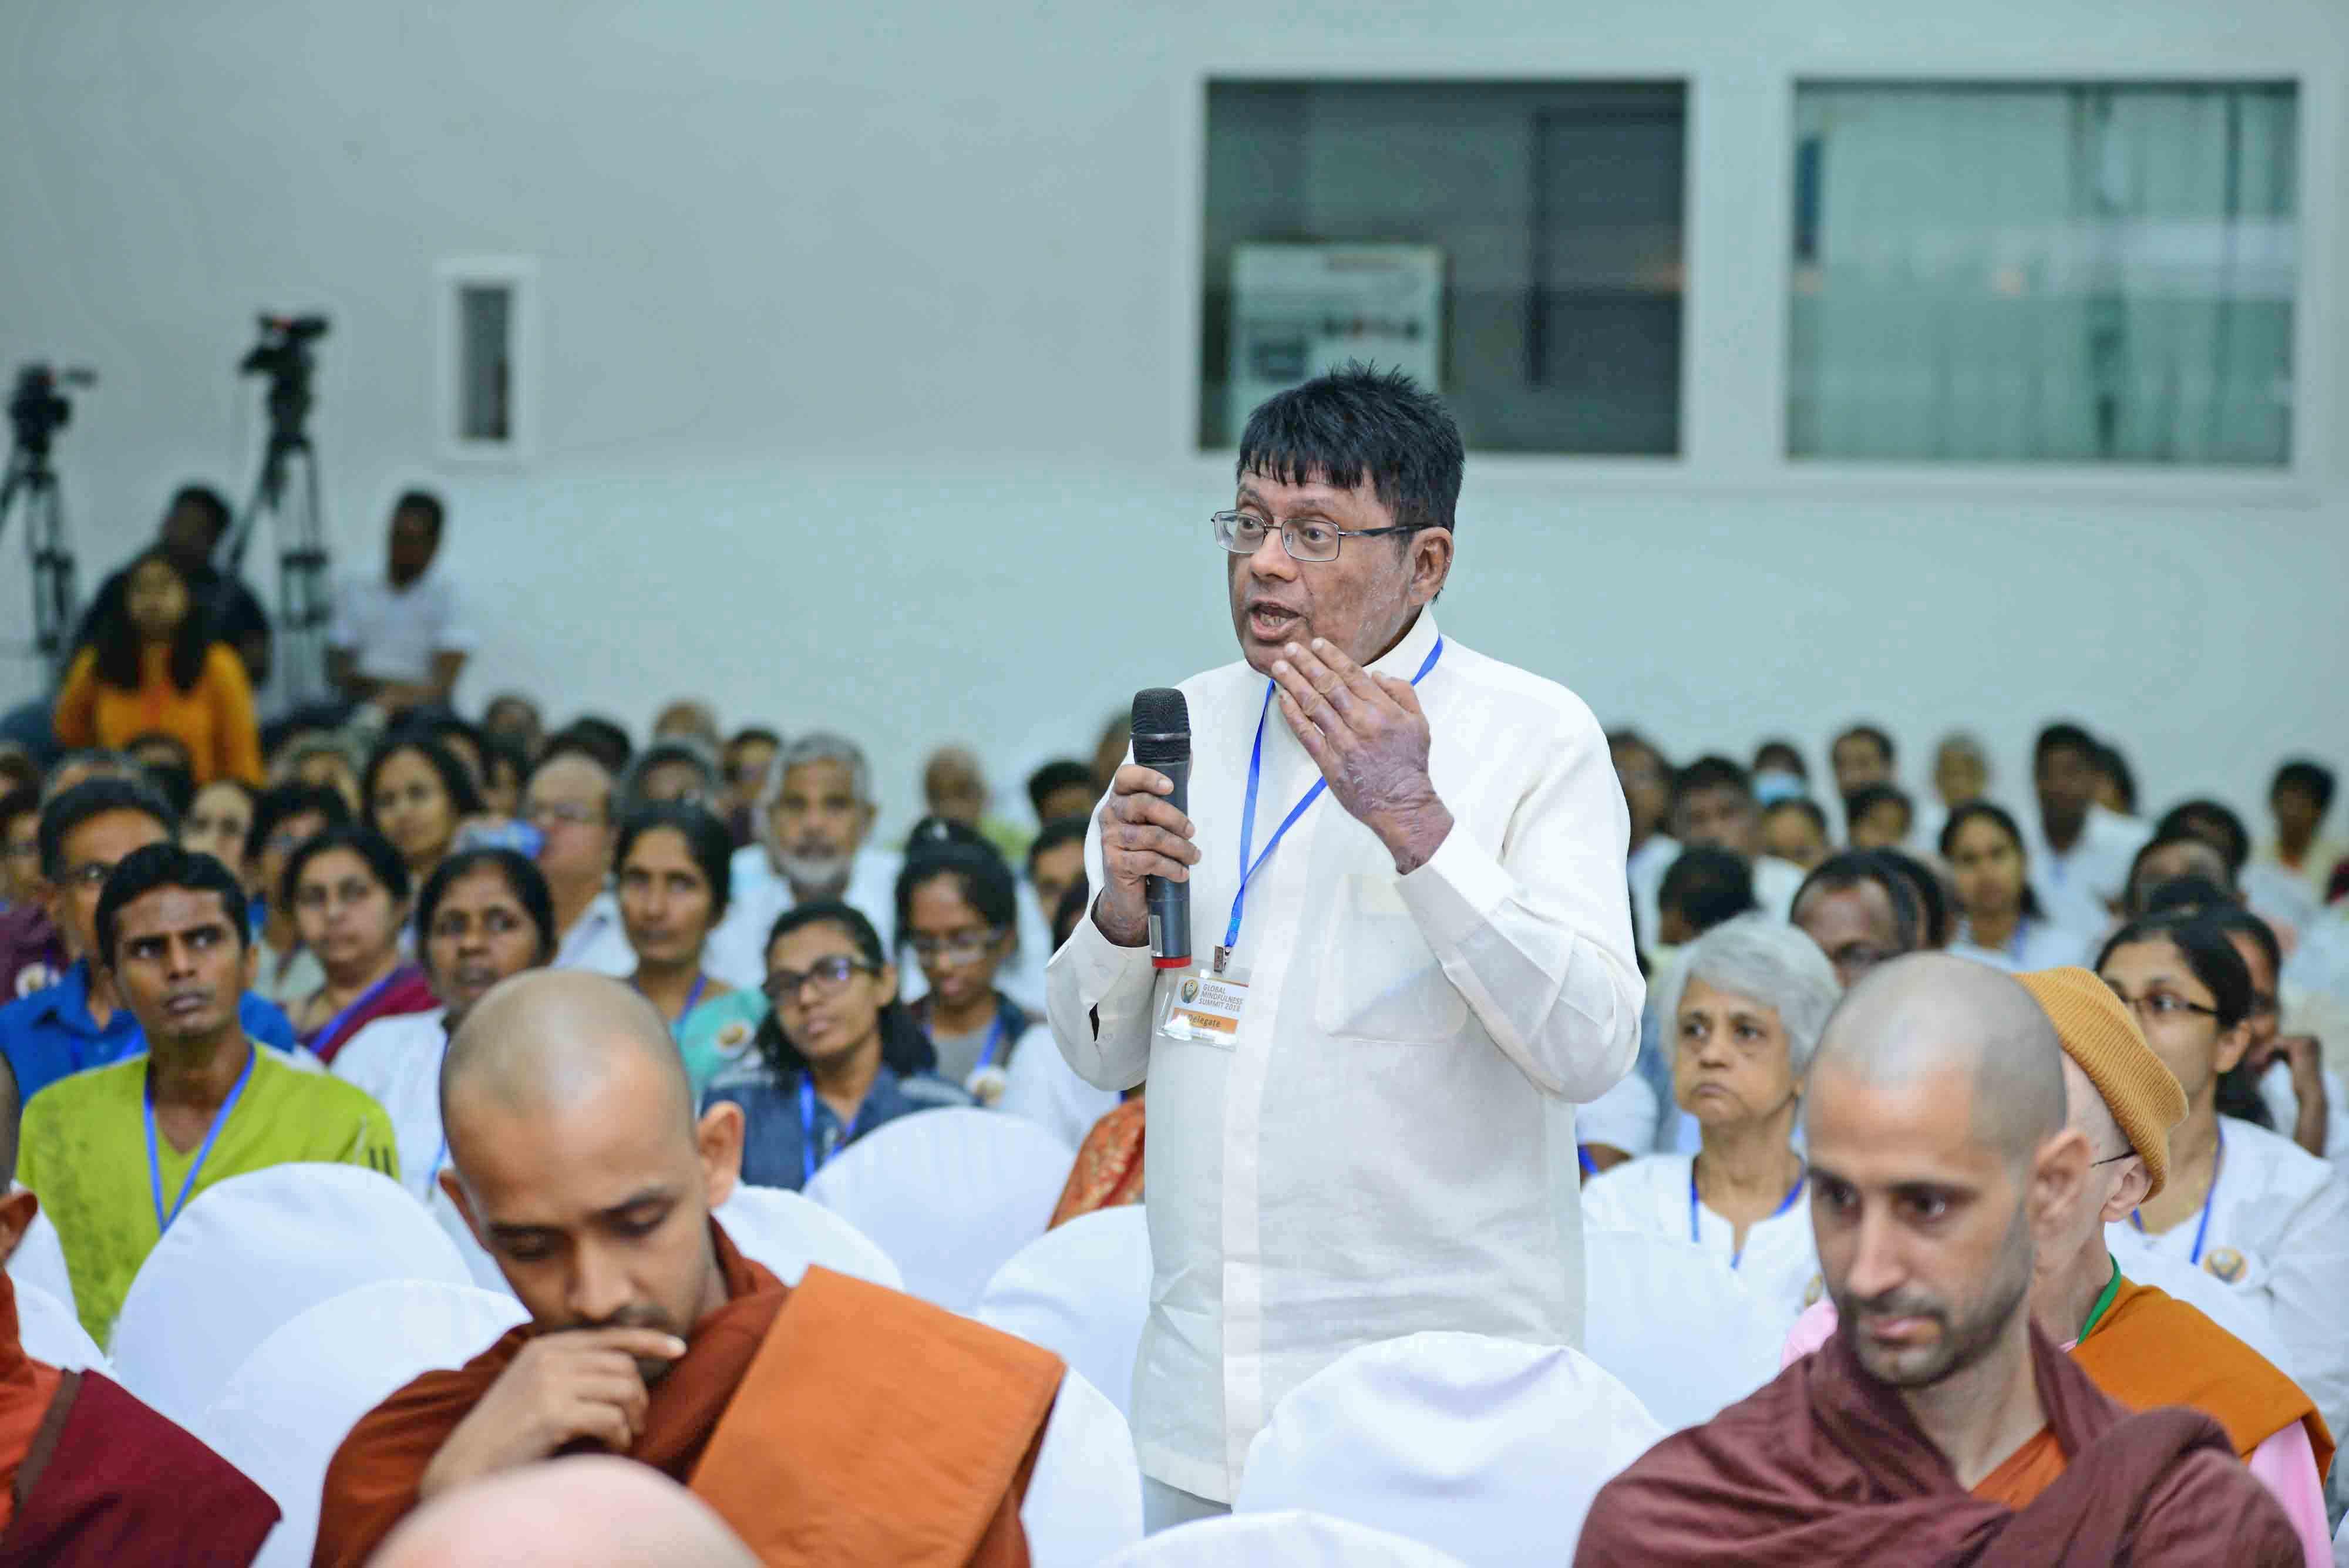 Global Mindfulness Summit 2018 - Day2 (85)